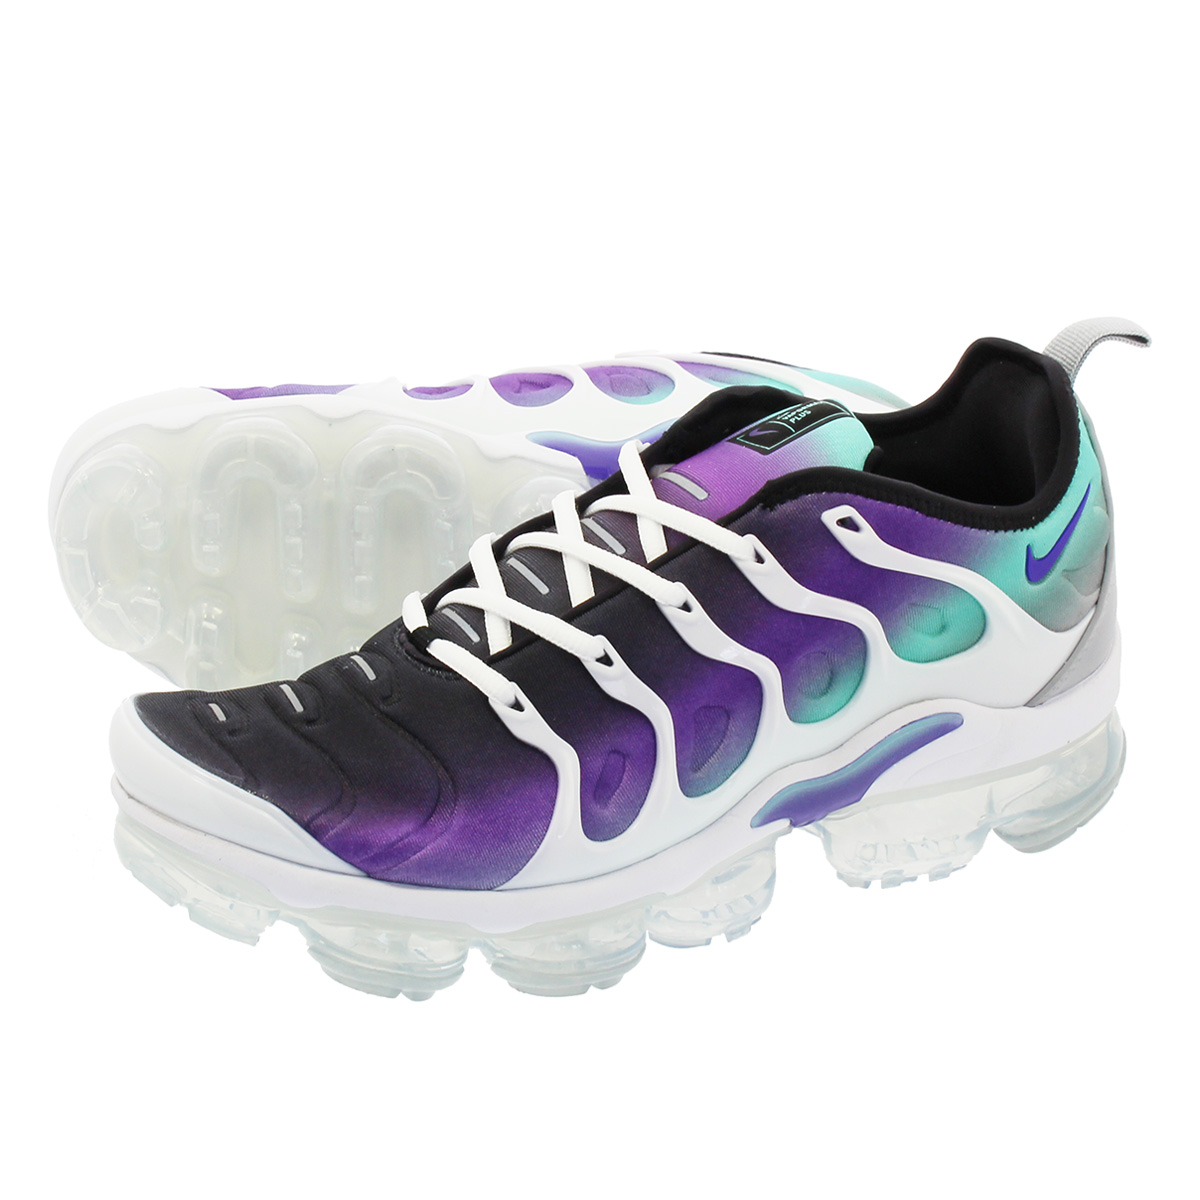 160cb653aa3 LOWTEX PLUS  NIKE AIR VAPORMAX PLUS Nike vapor max plus WHITE FIERCE ...